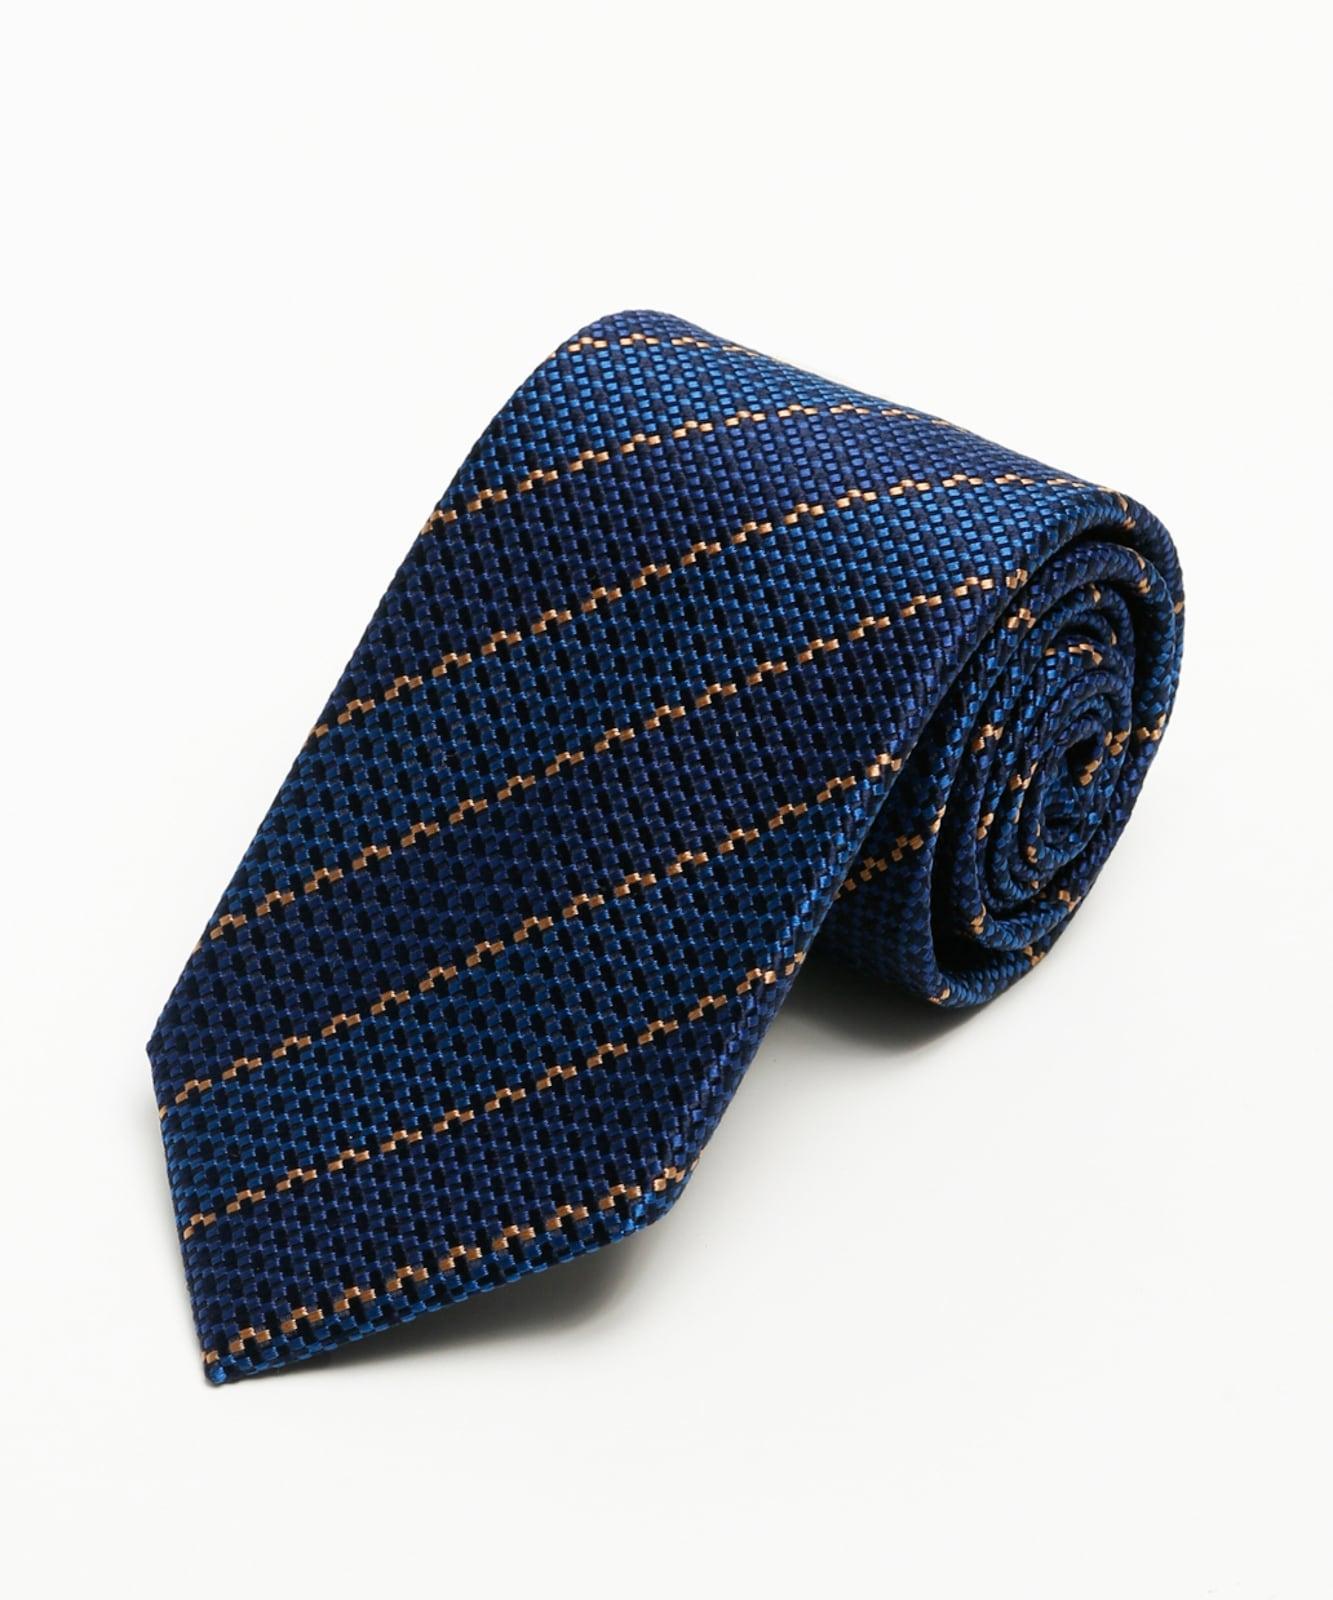 Franco Spada 2色使い変わり織りストライプ:ブルー+オレンジ